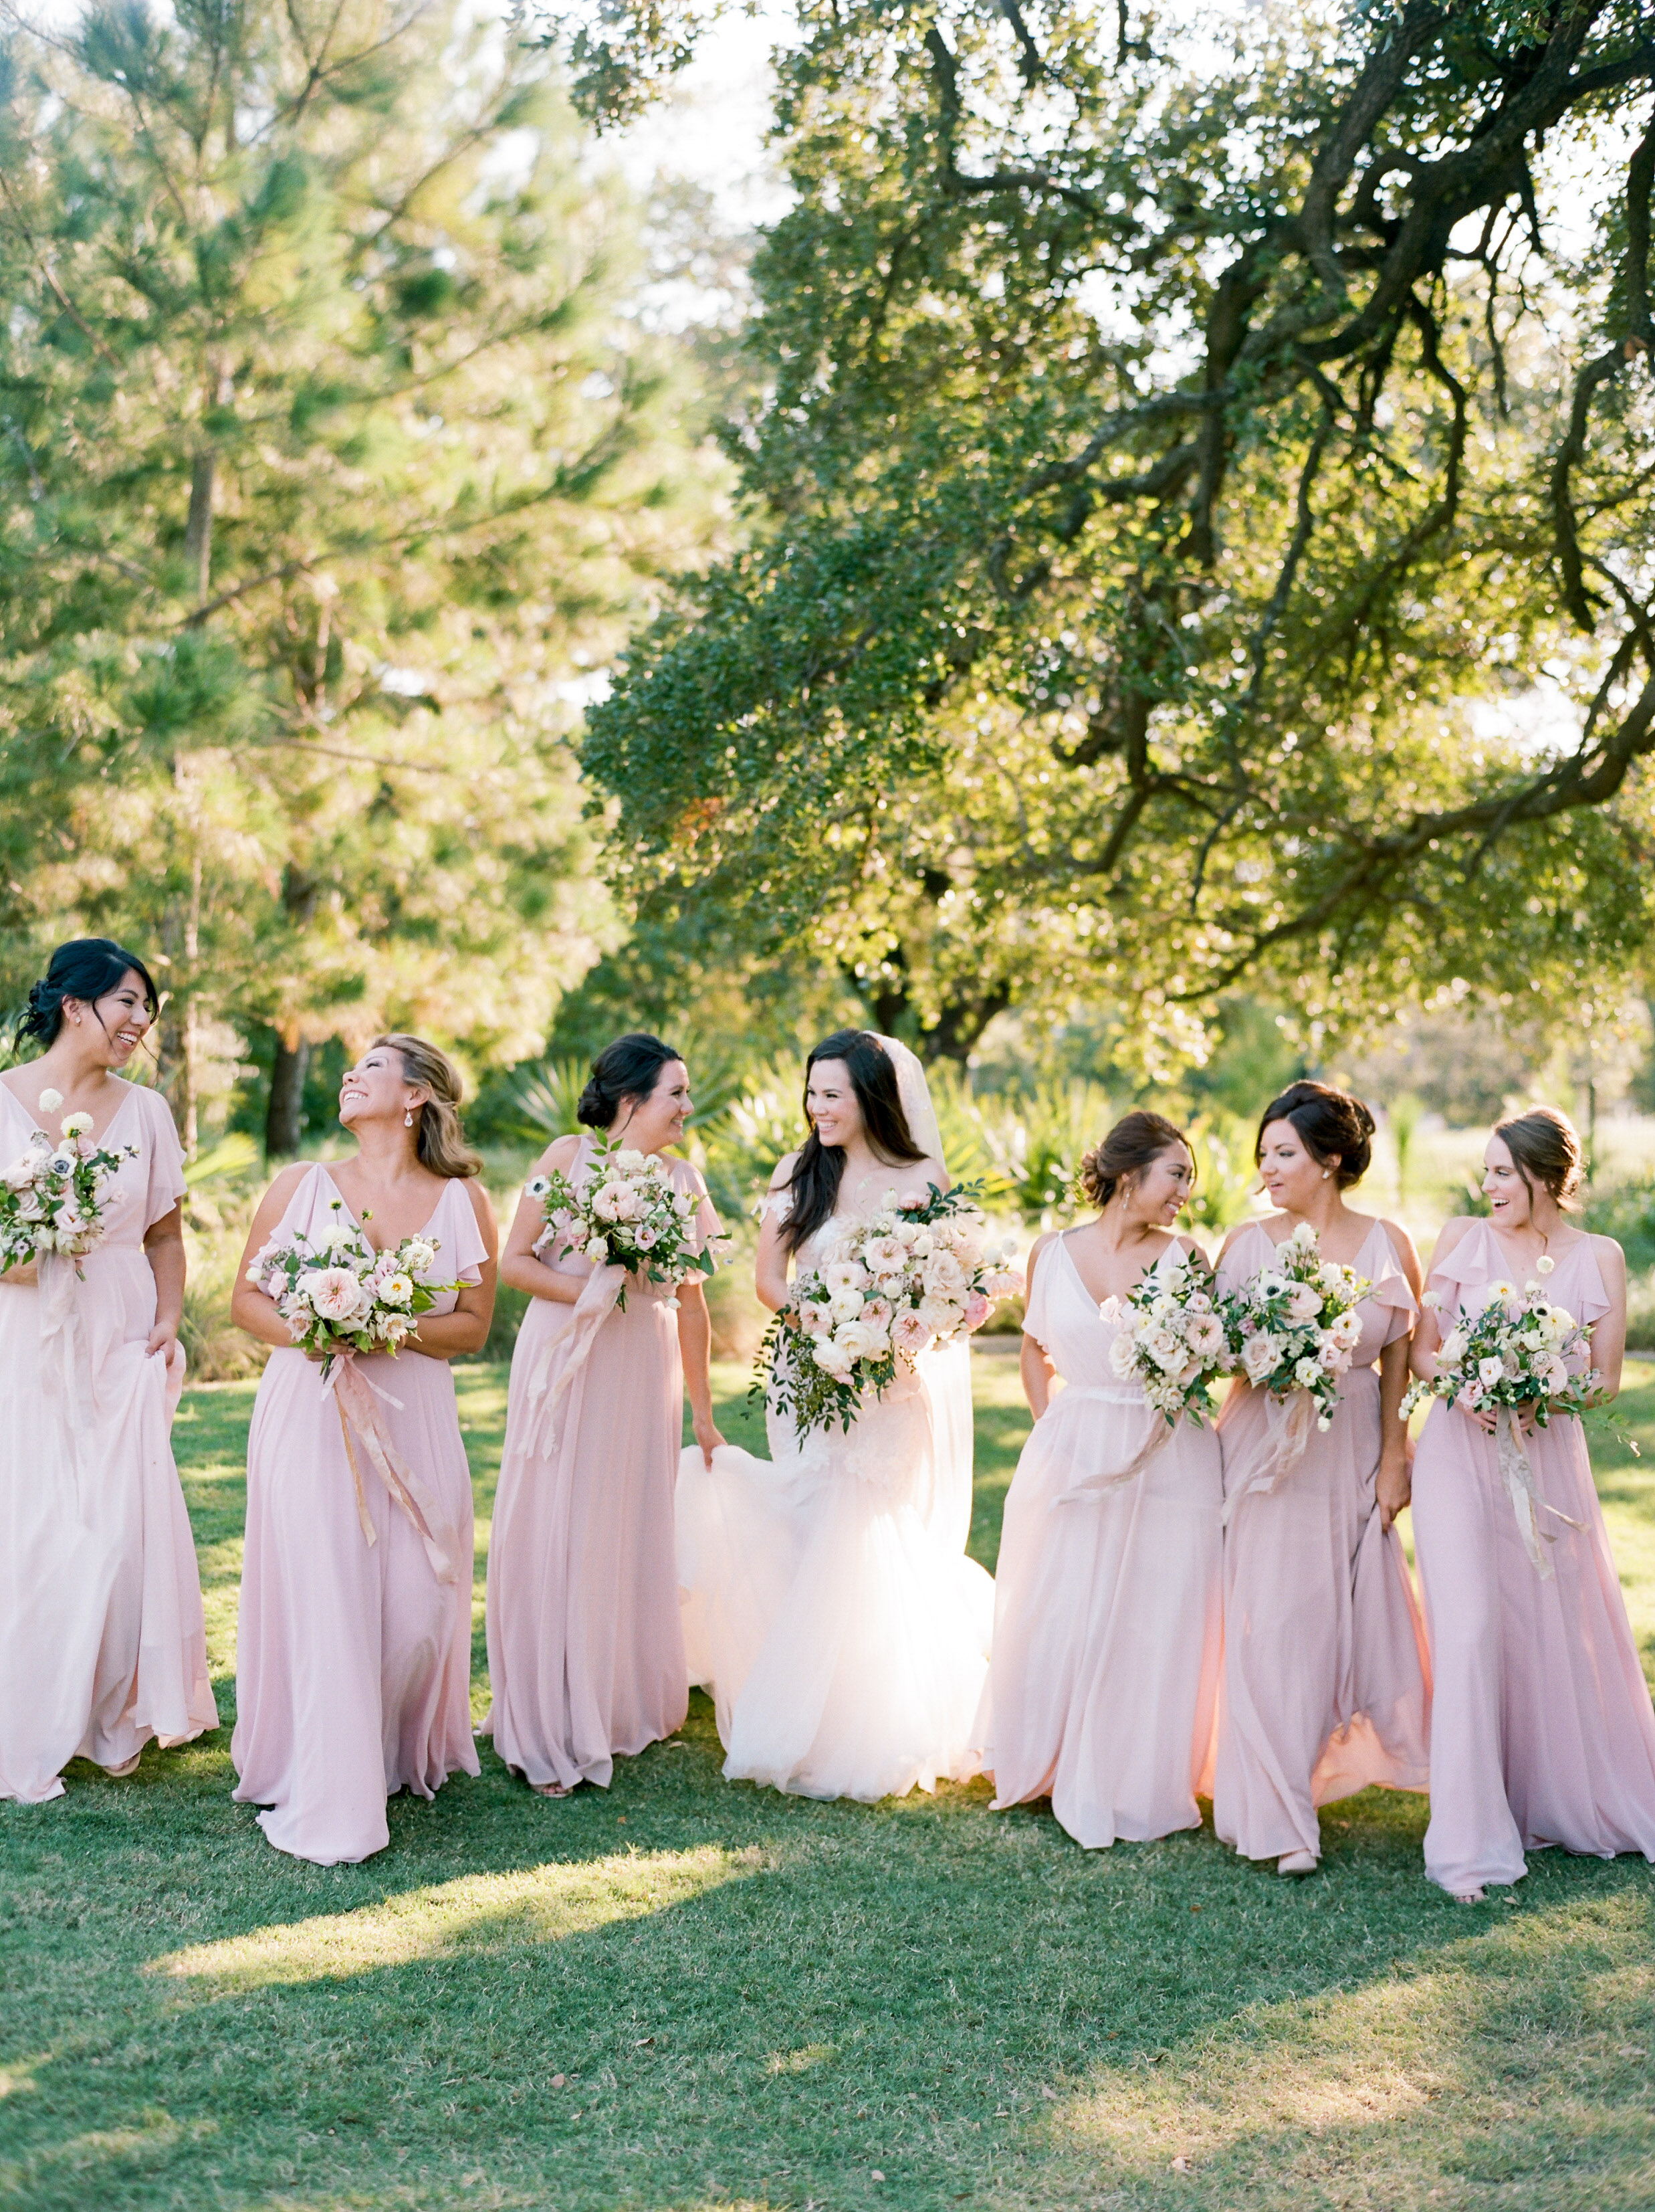 Martha-Stewart-Wedding-Dana-Fernandez-Photography-Josh-Texas-Film-Houston-Wedding-Fine-Art-Photographer-McGovern-Centennial-Gardens-Top-Best-22.jpg